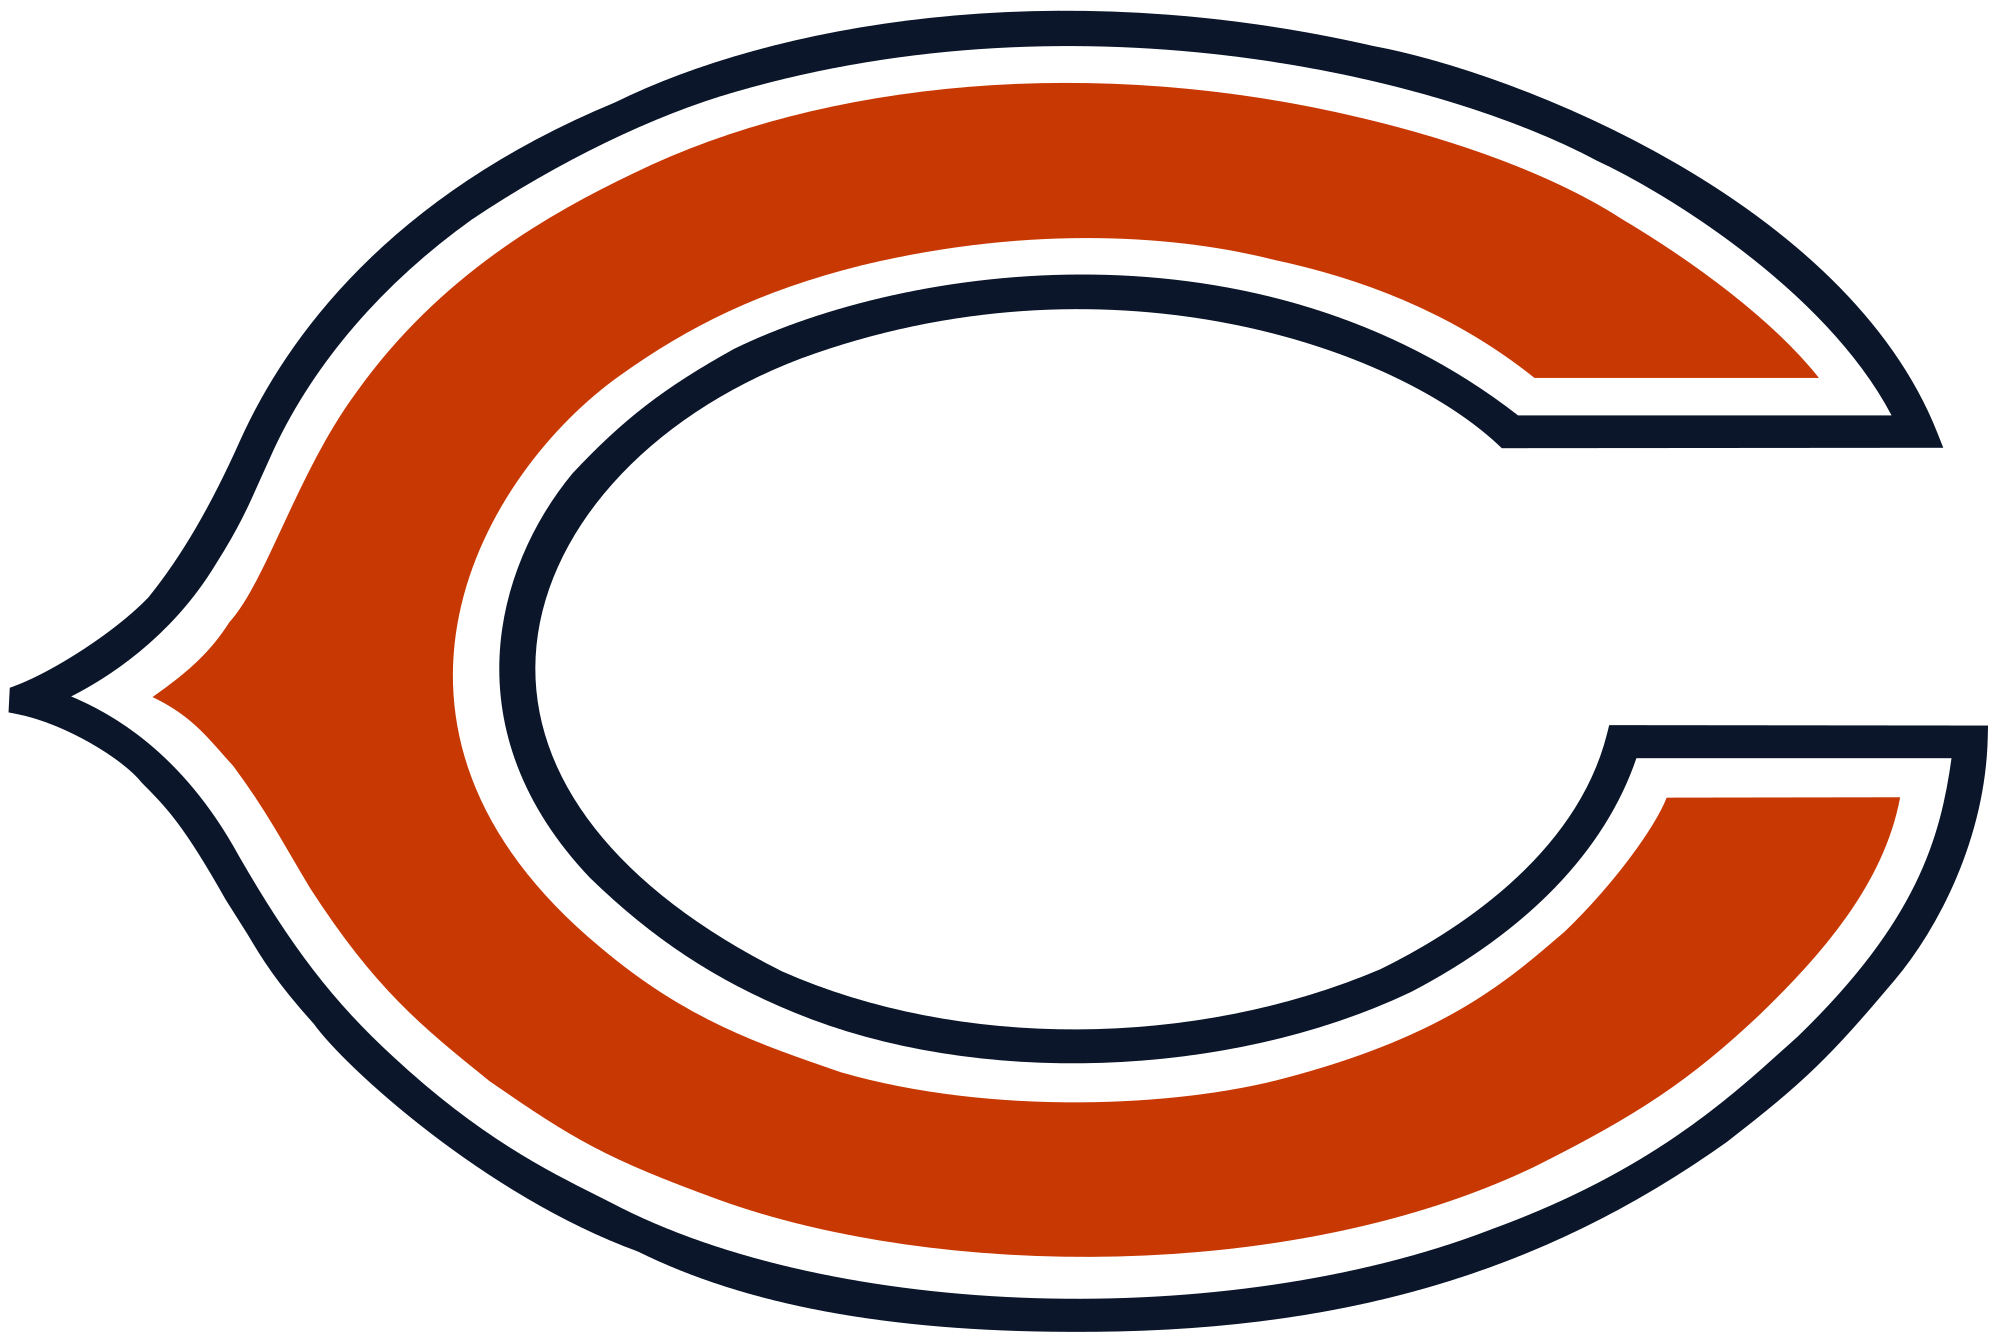 Datei:Chicago Bears logo.svg.